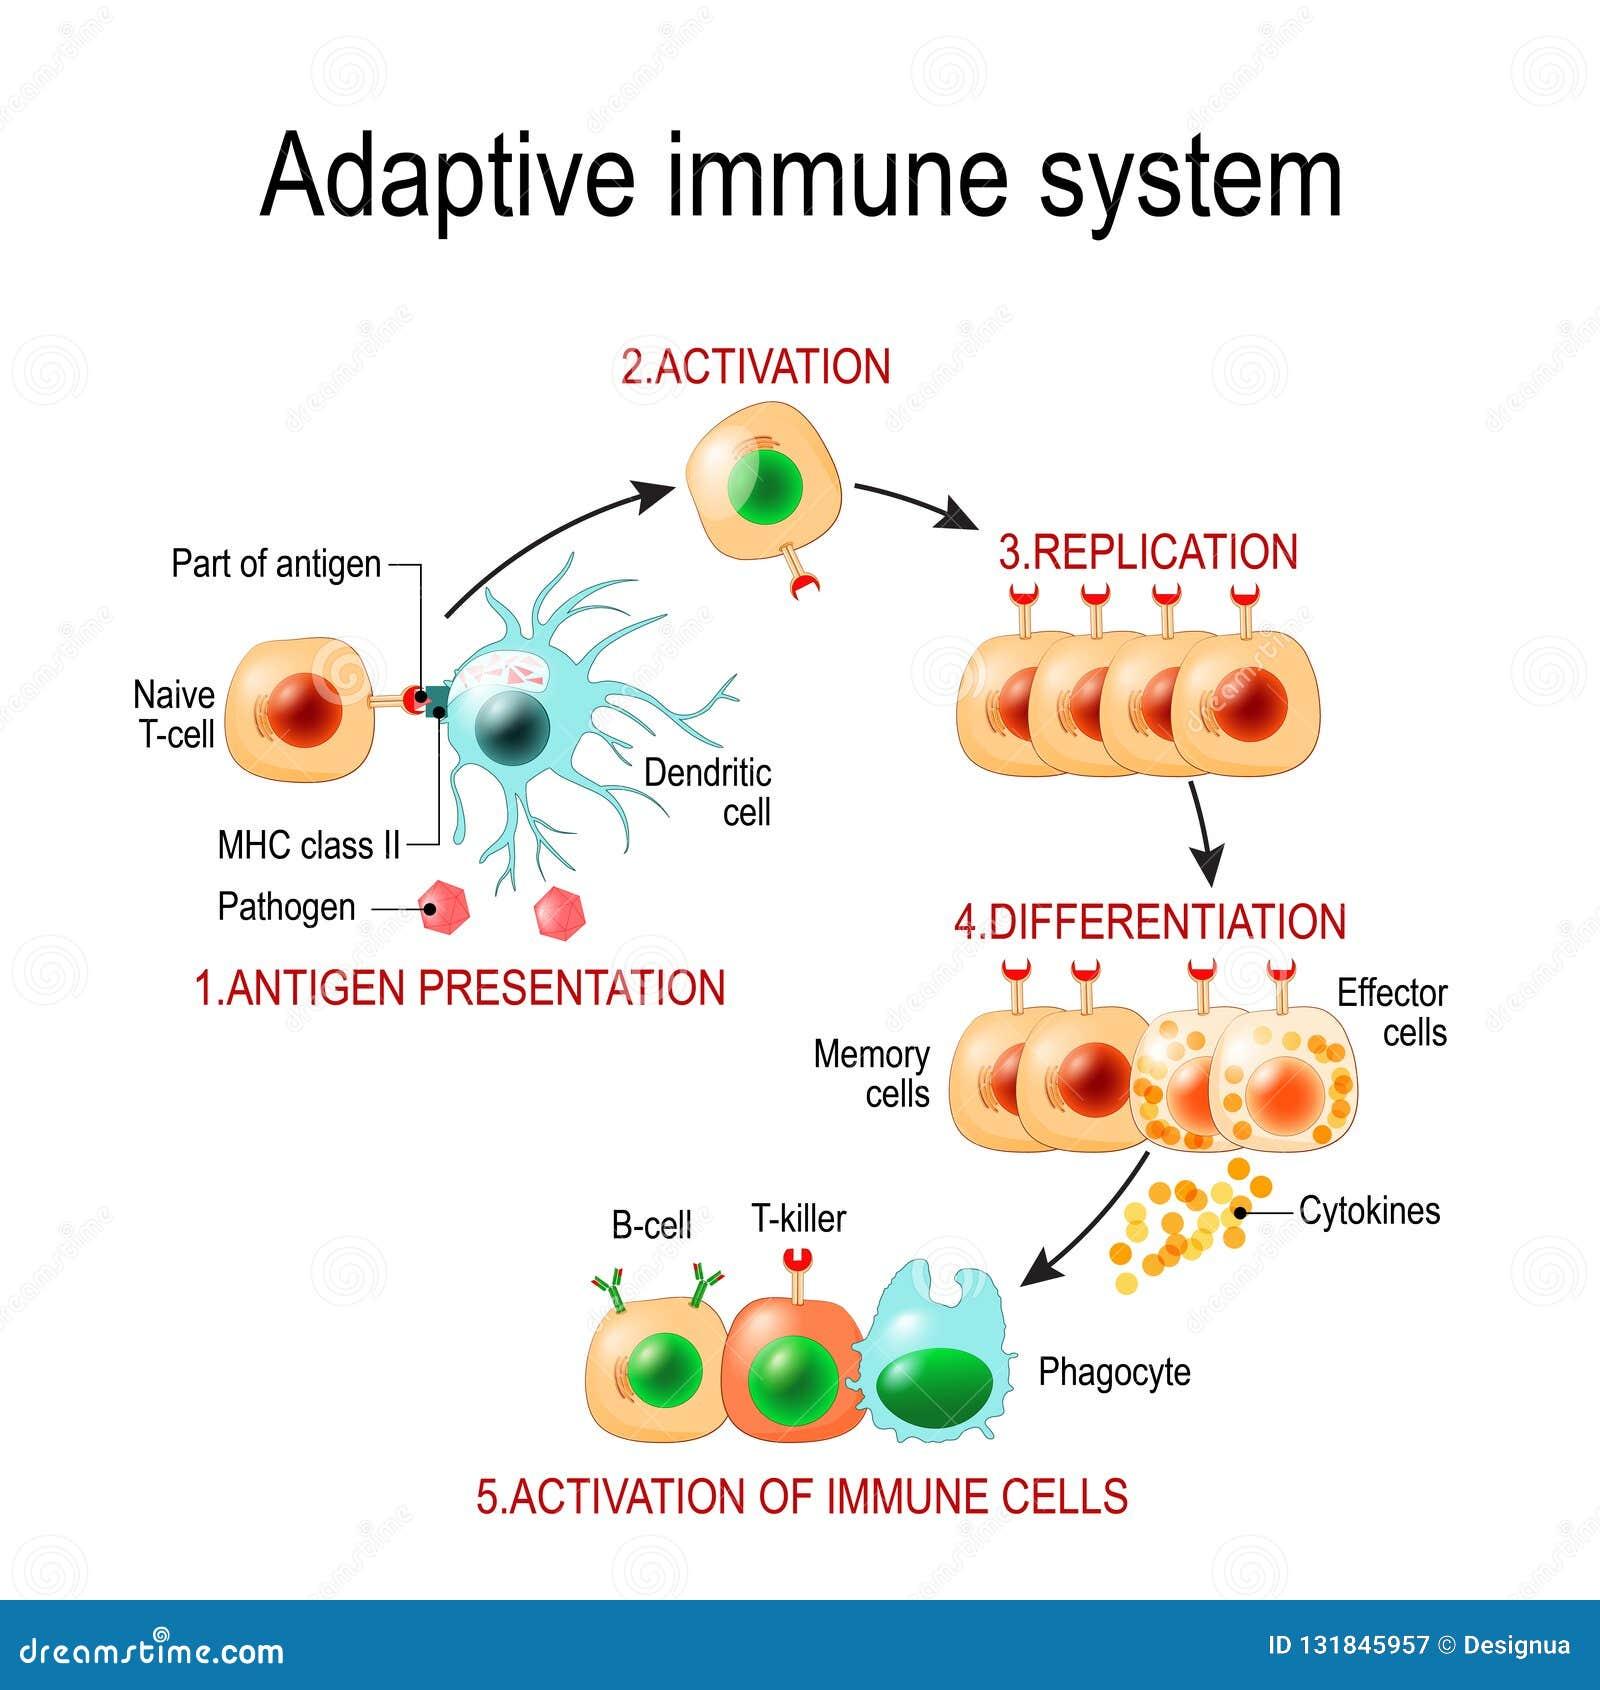 Immune System Diagram.Adaptive Immune System From Antigen Presentation To